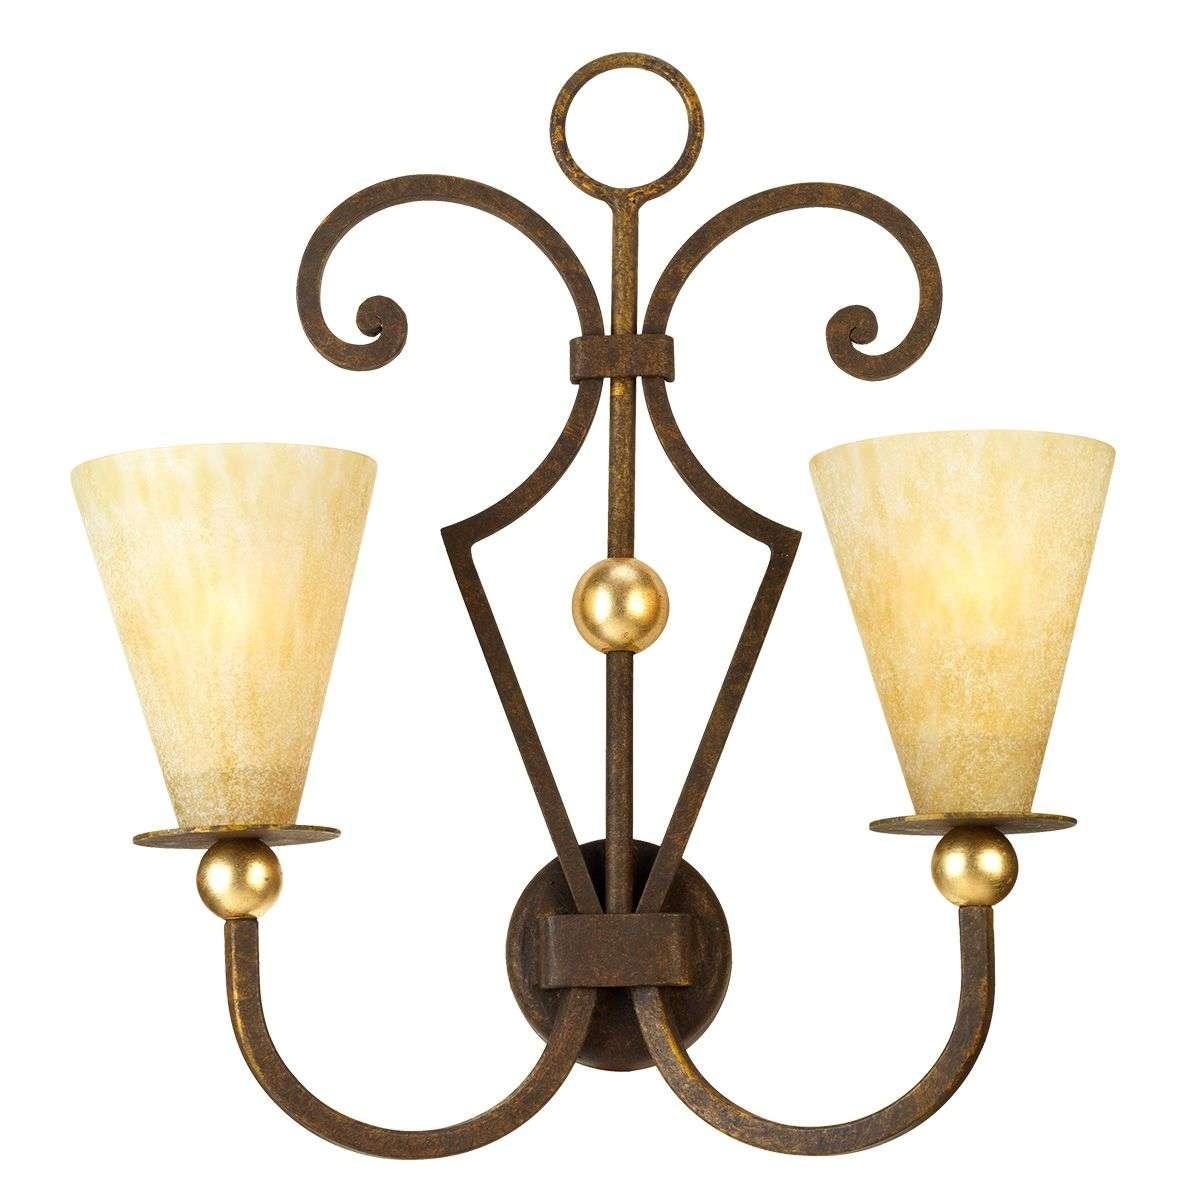 ornate lighting. Wall Light Kytheras With An Ornate Frame-6069142-31 Lighting N